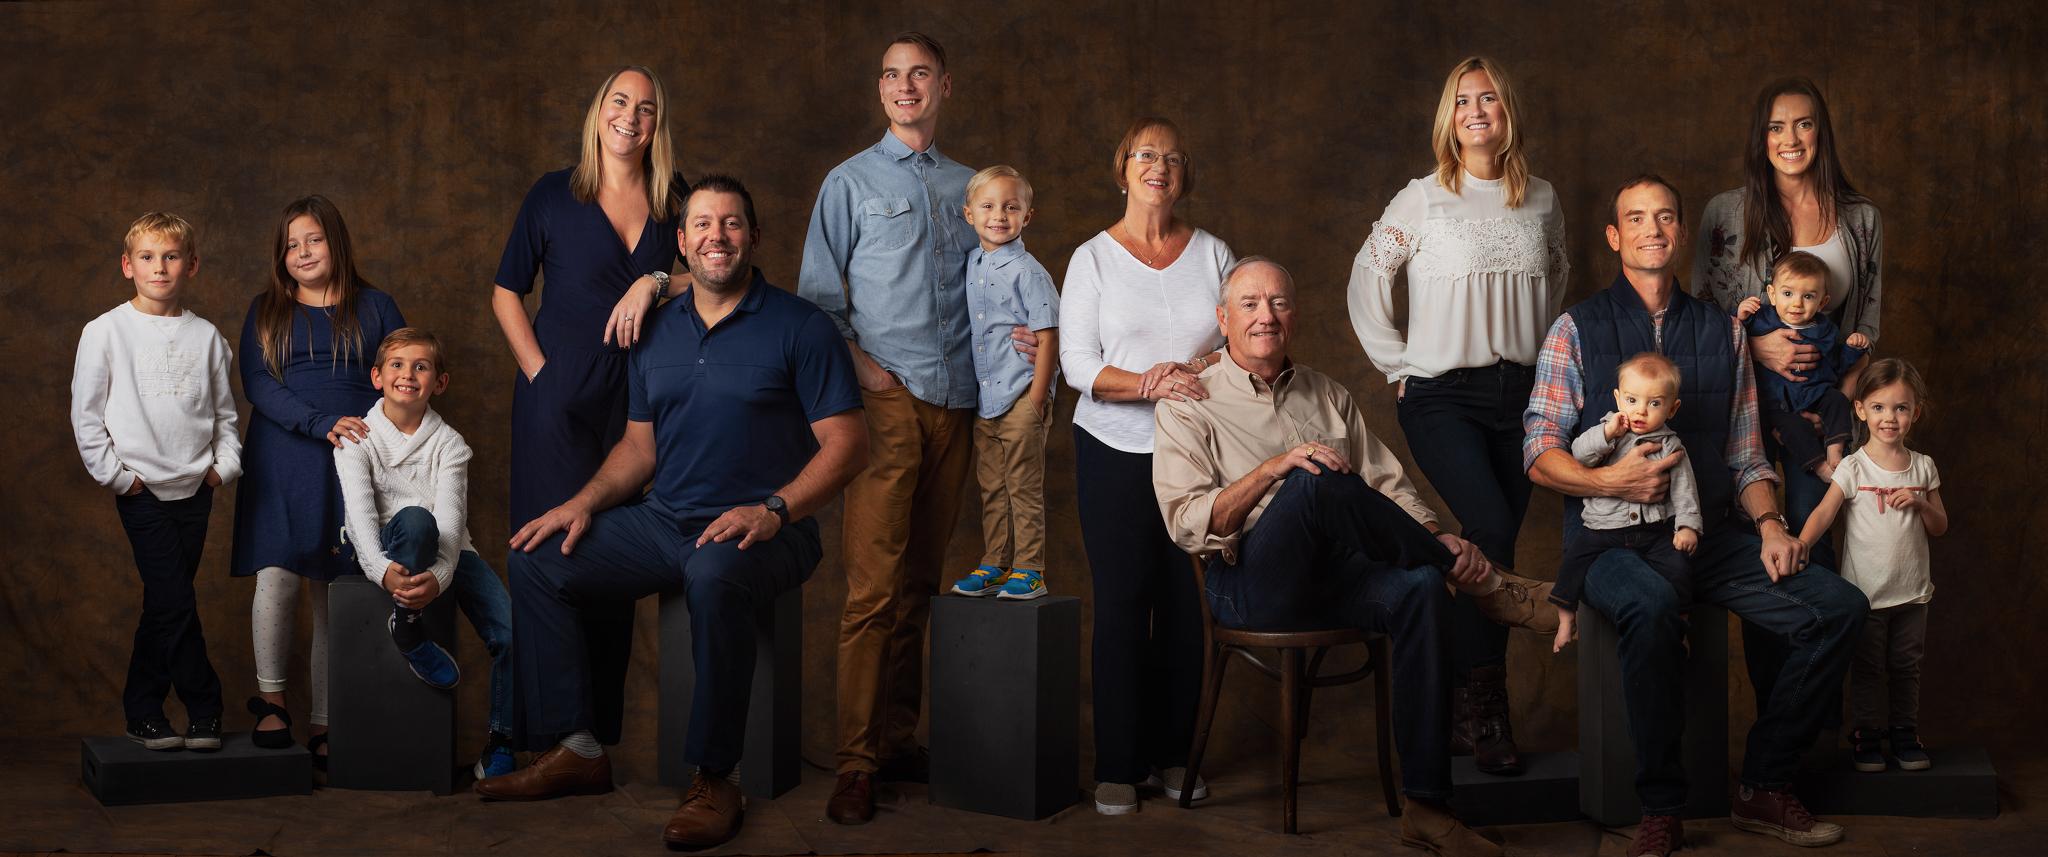 Family portrait creative fun.jpg